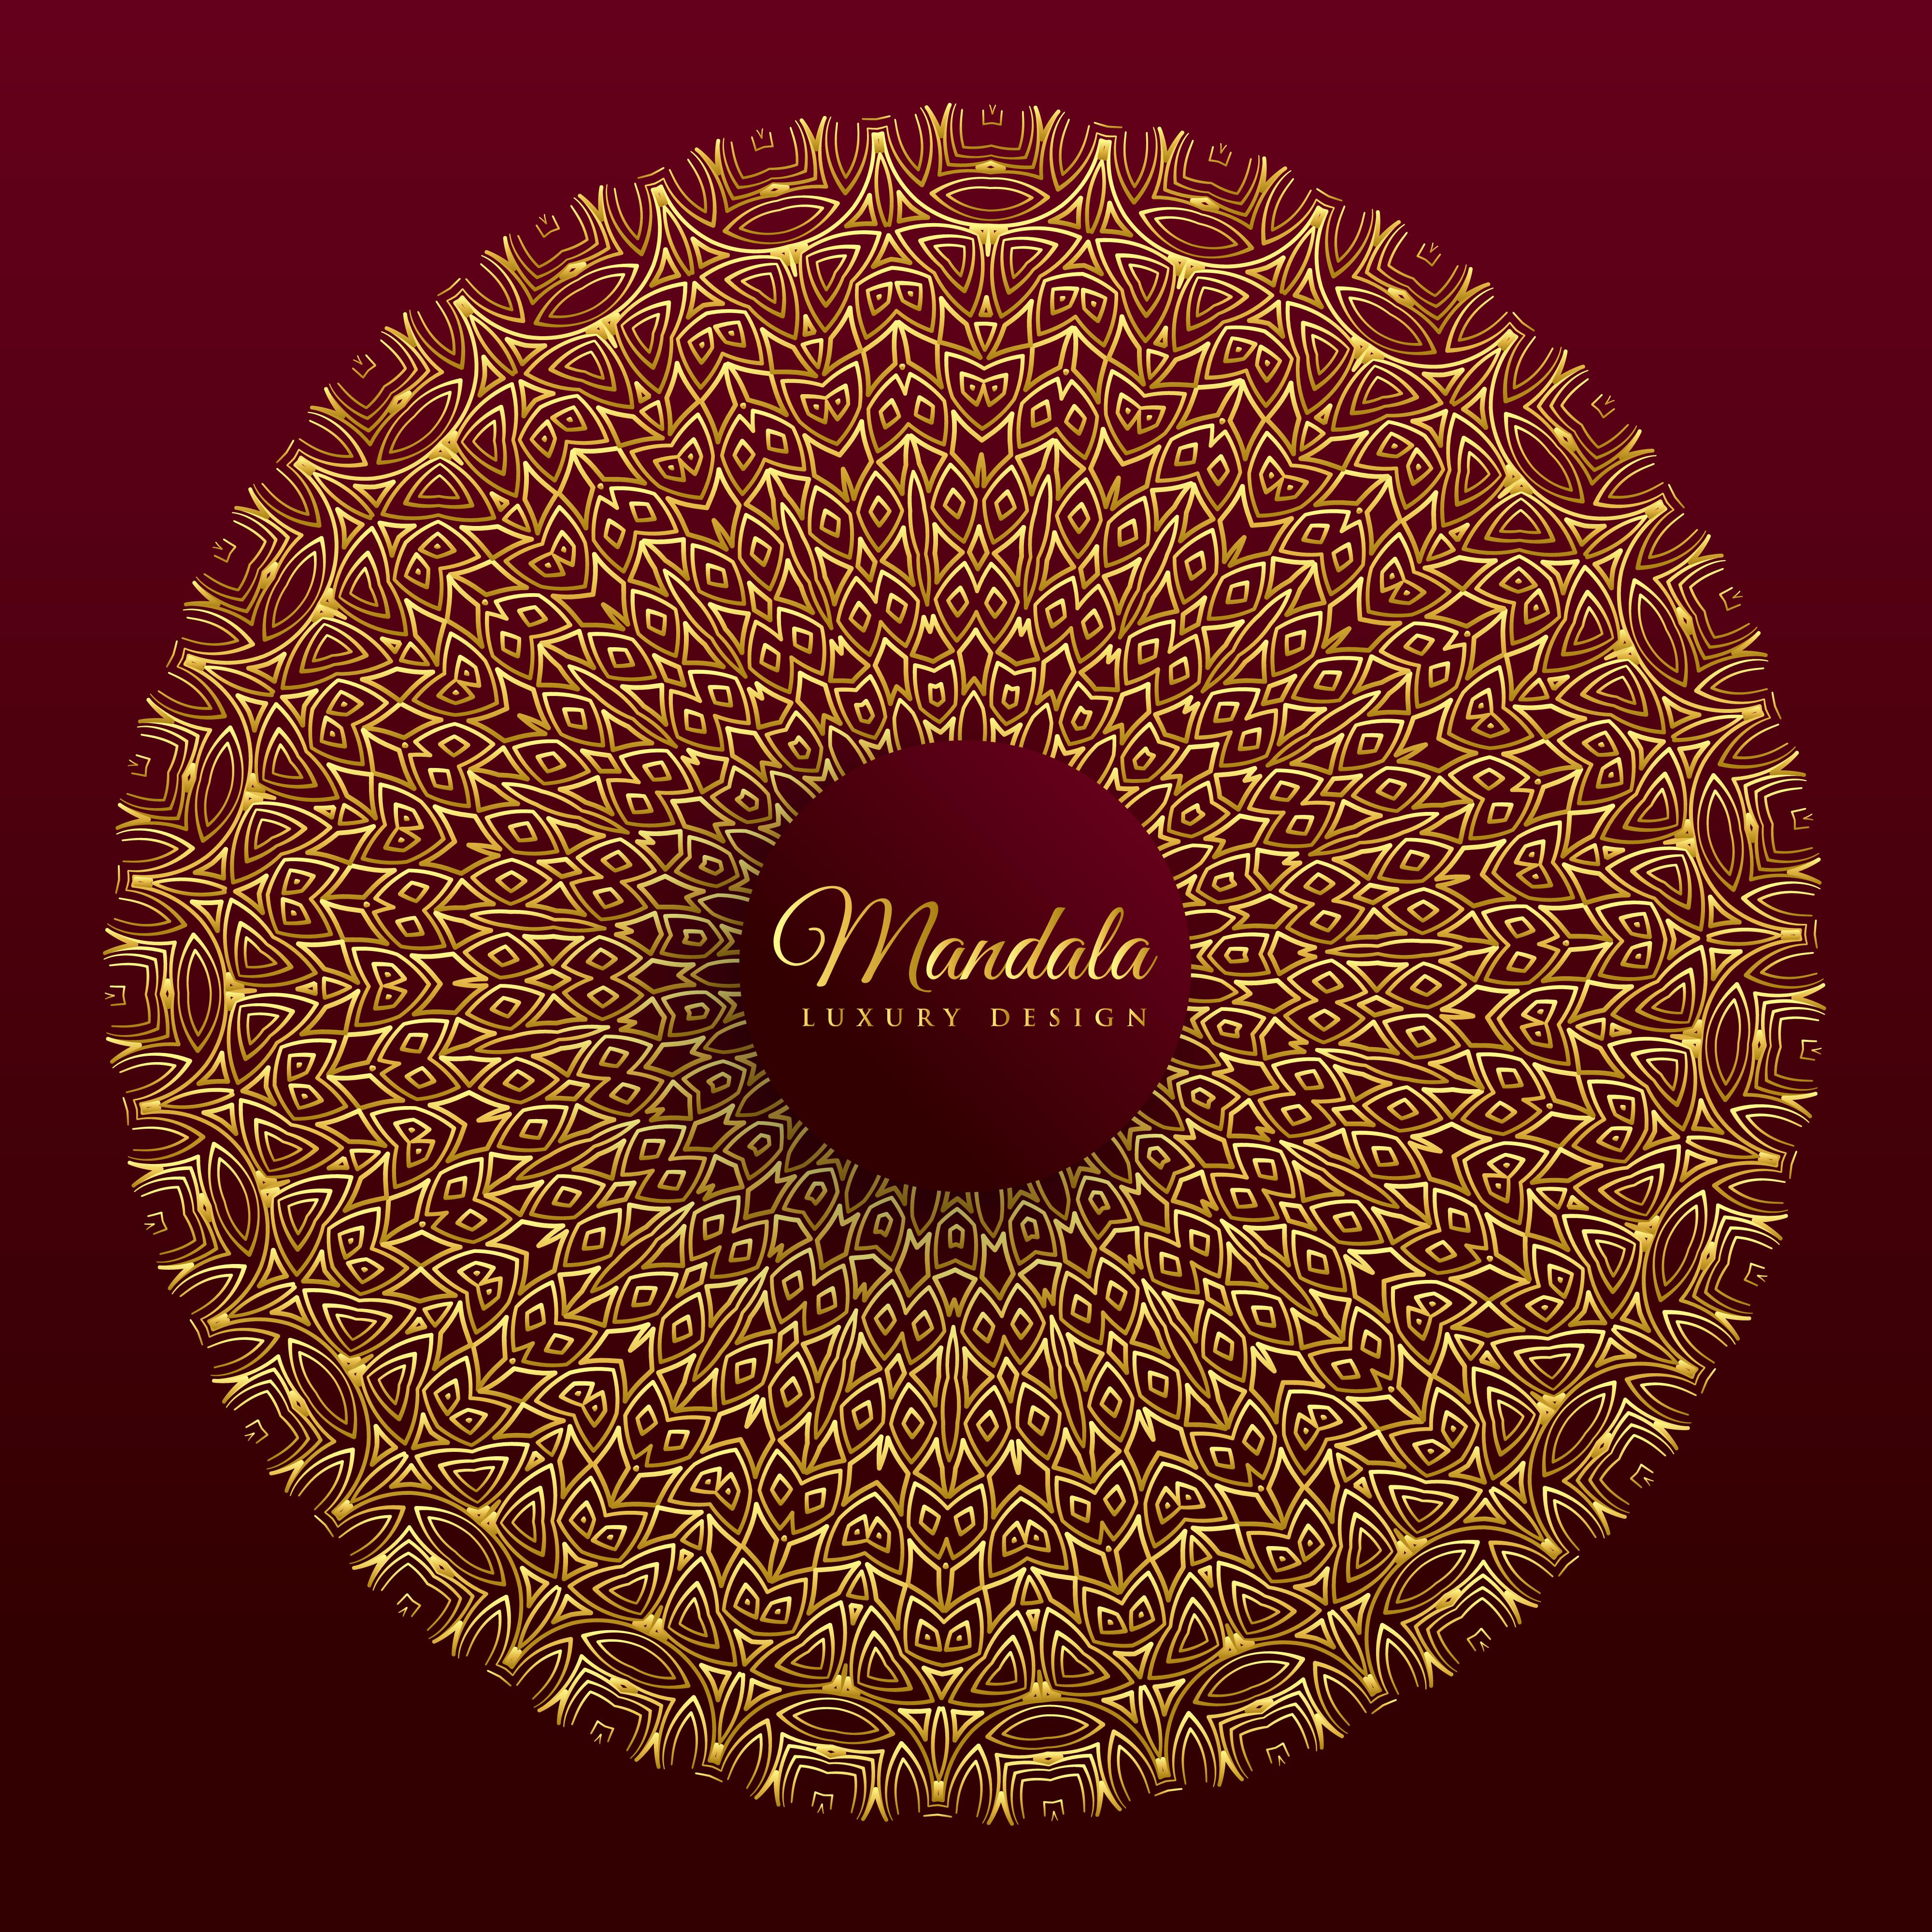 luxury mandala vector banner design - Download Free Vector ...